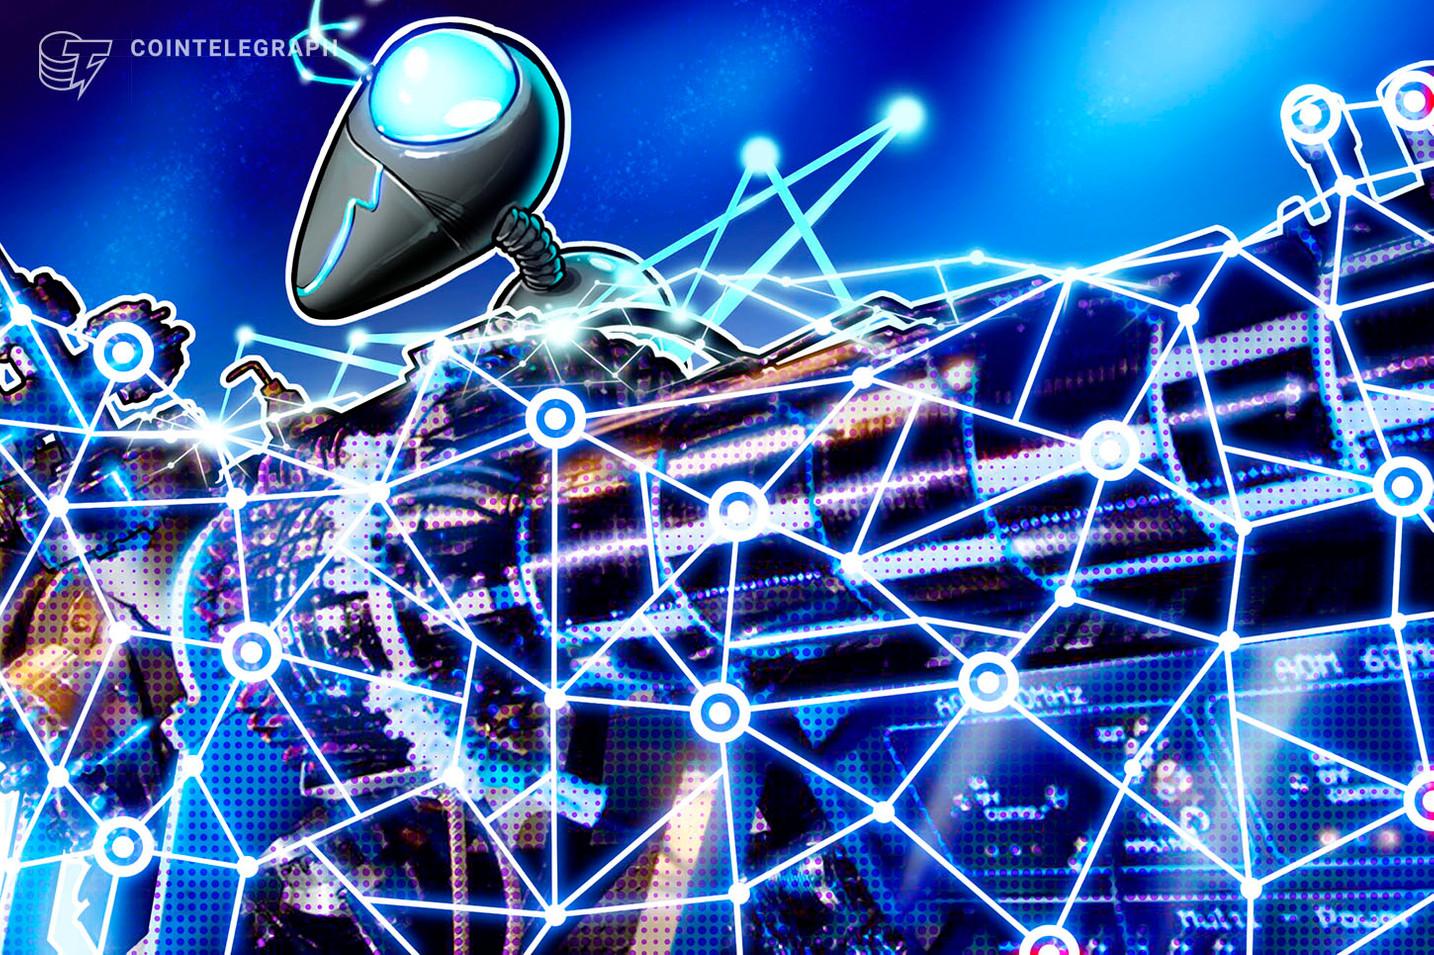 Blockchain Supply Chain Platform Gains Metals Giant Glencore as Member